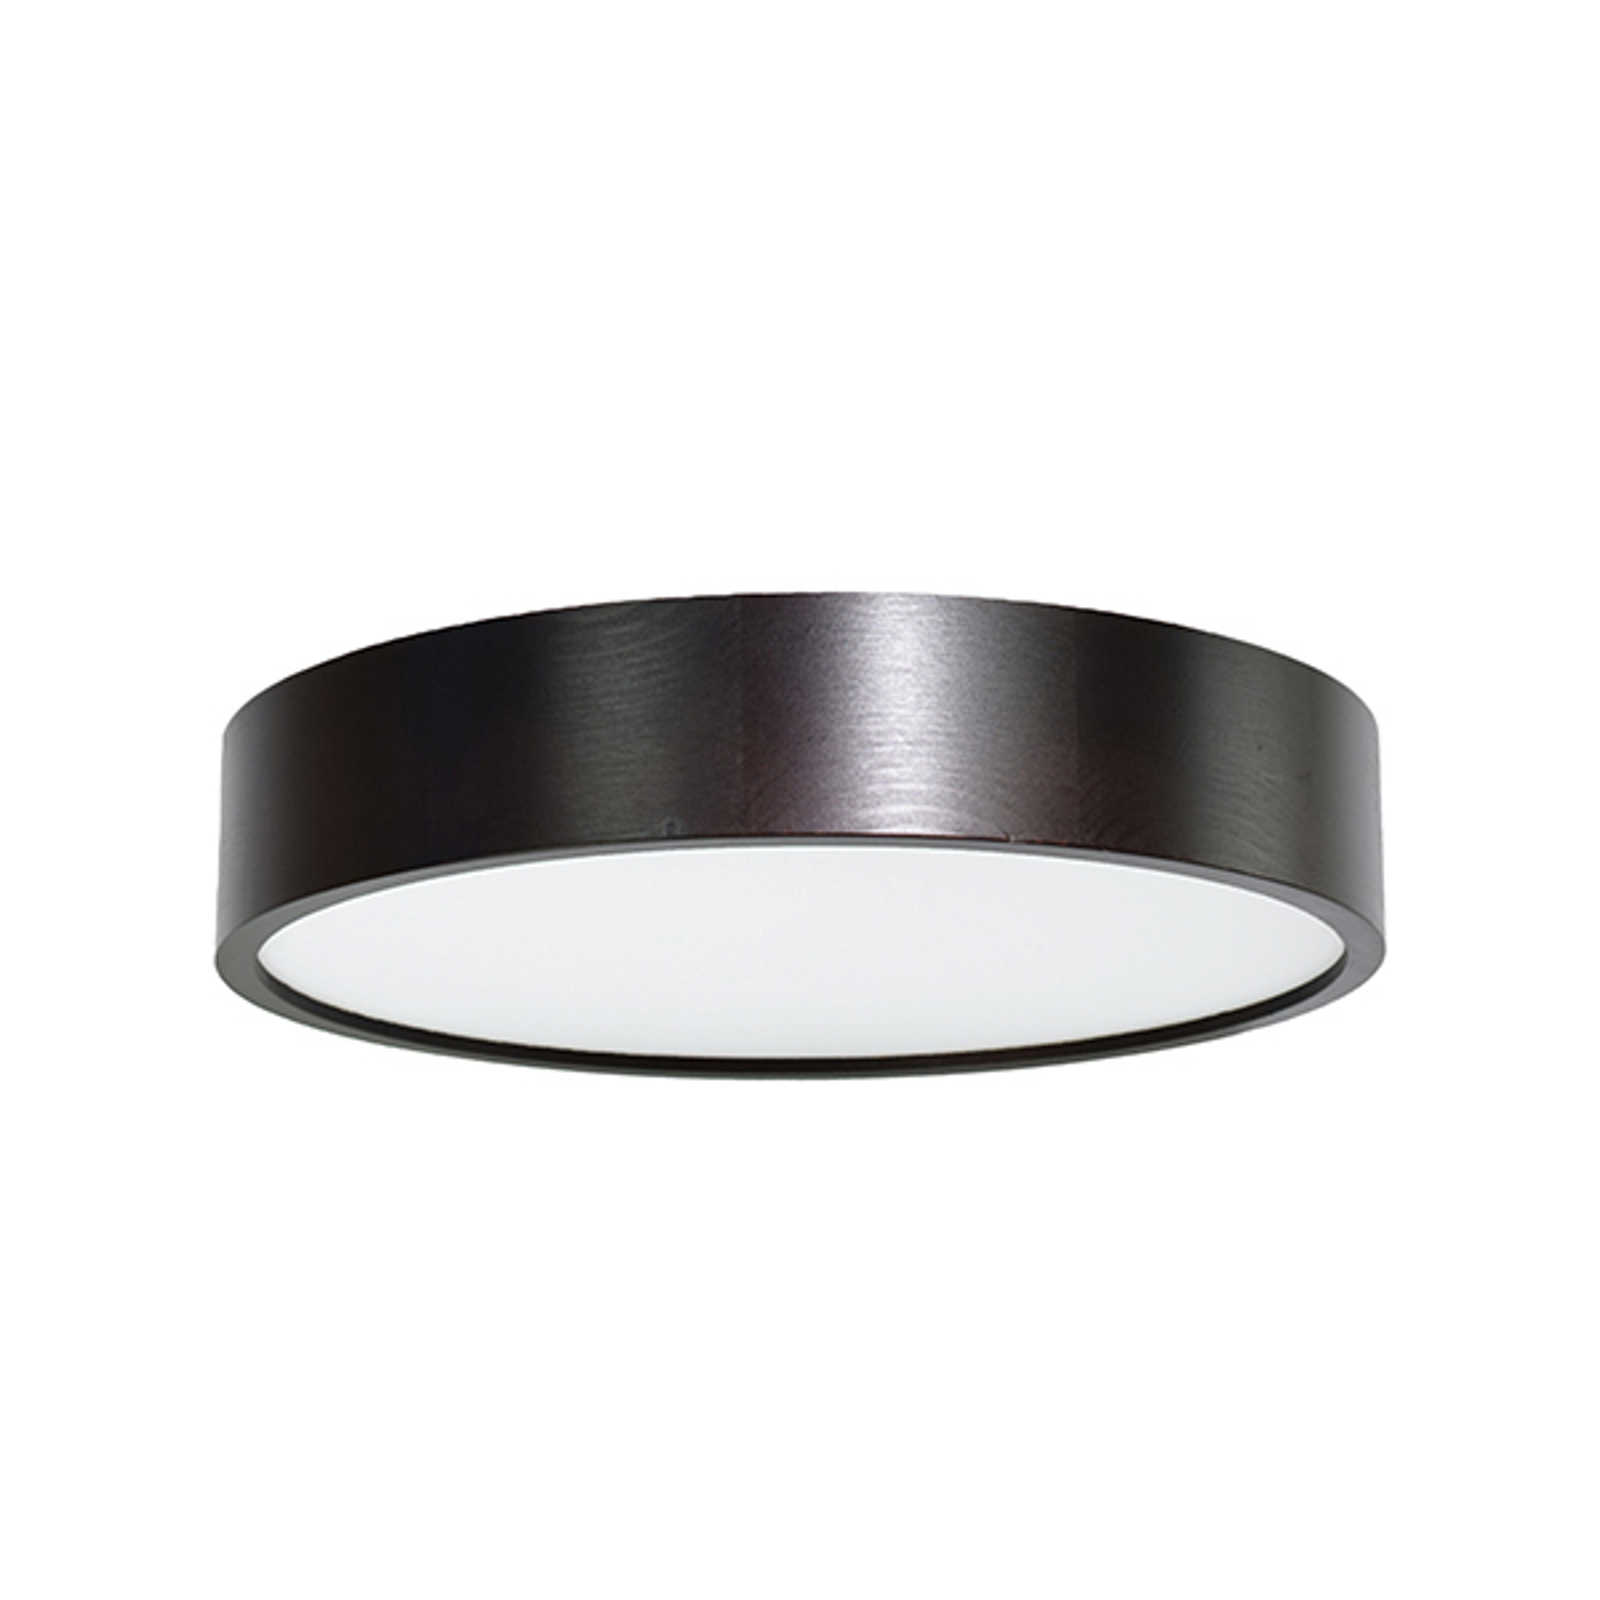 LED-taklampe Cleo, Ø38cm svart